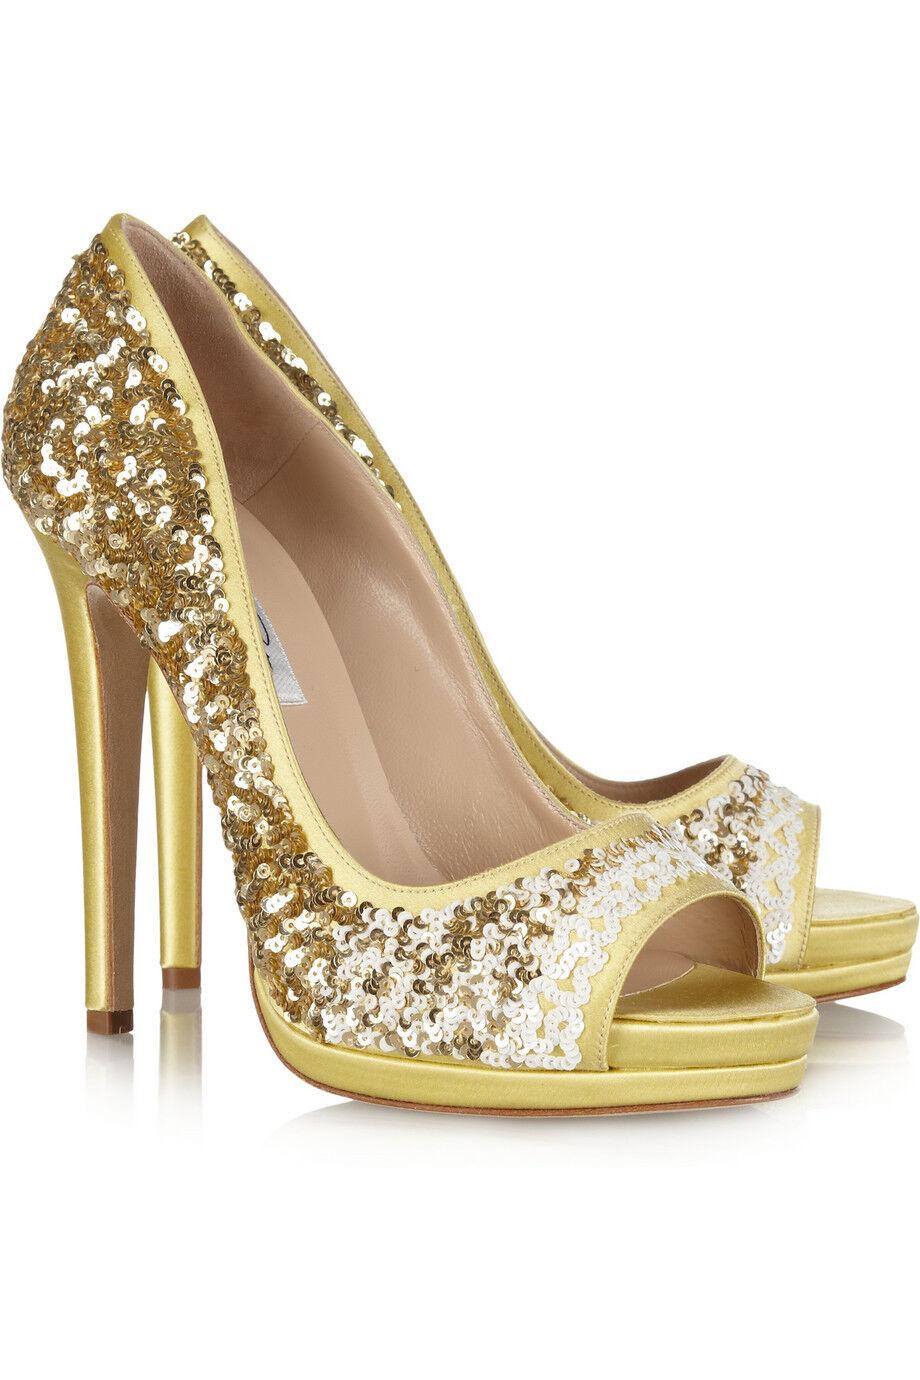 NIB Oscar de la Renta Valerie Satin Sequin Peep-Toe Heel - Size 40 -  895